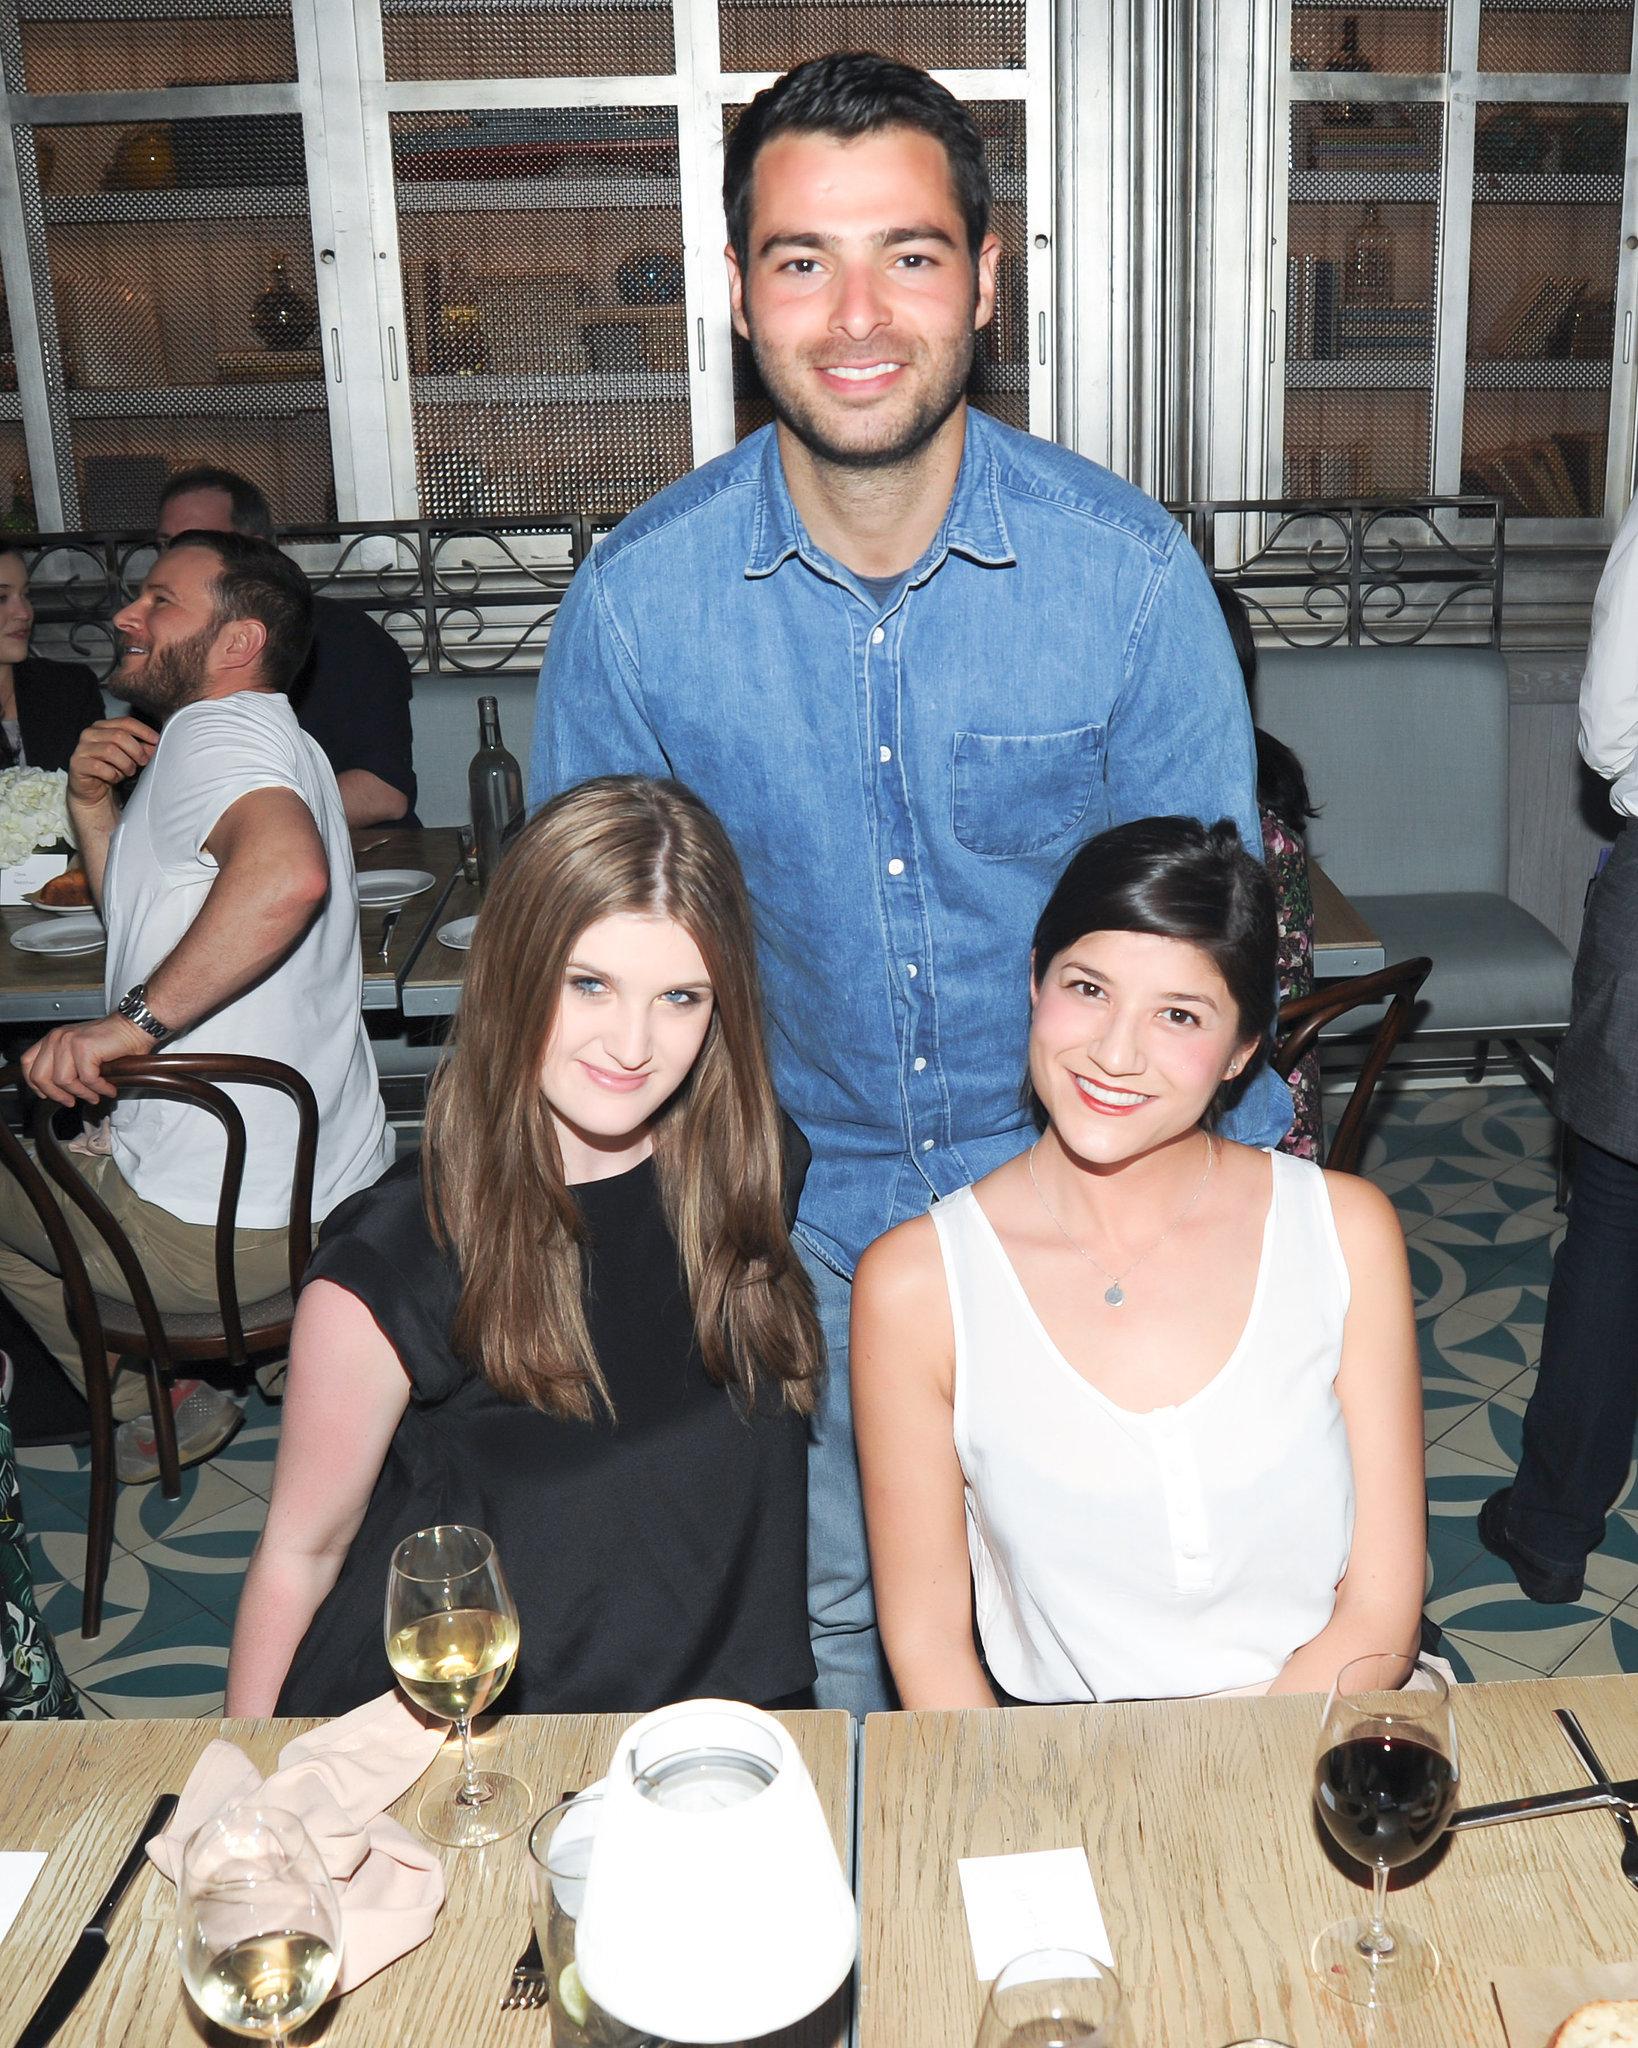 Chloe Post, Jonathan Simkhai, and Kristine Mittendorf